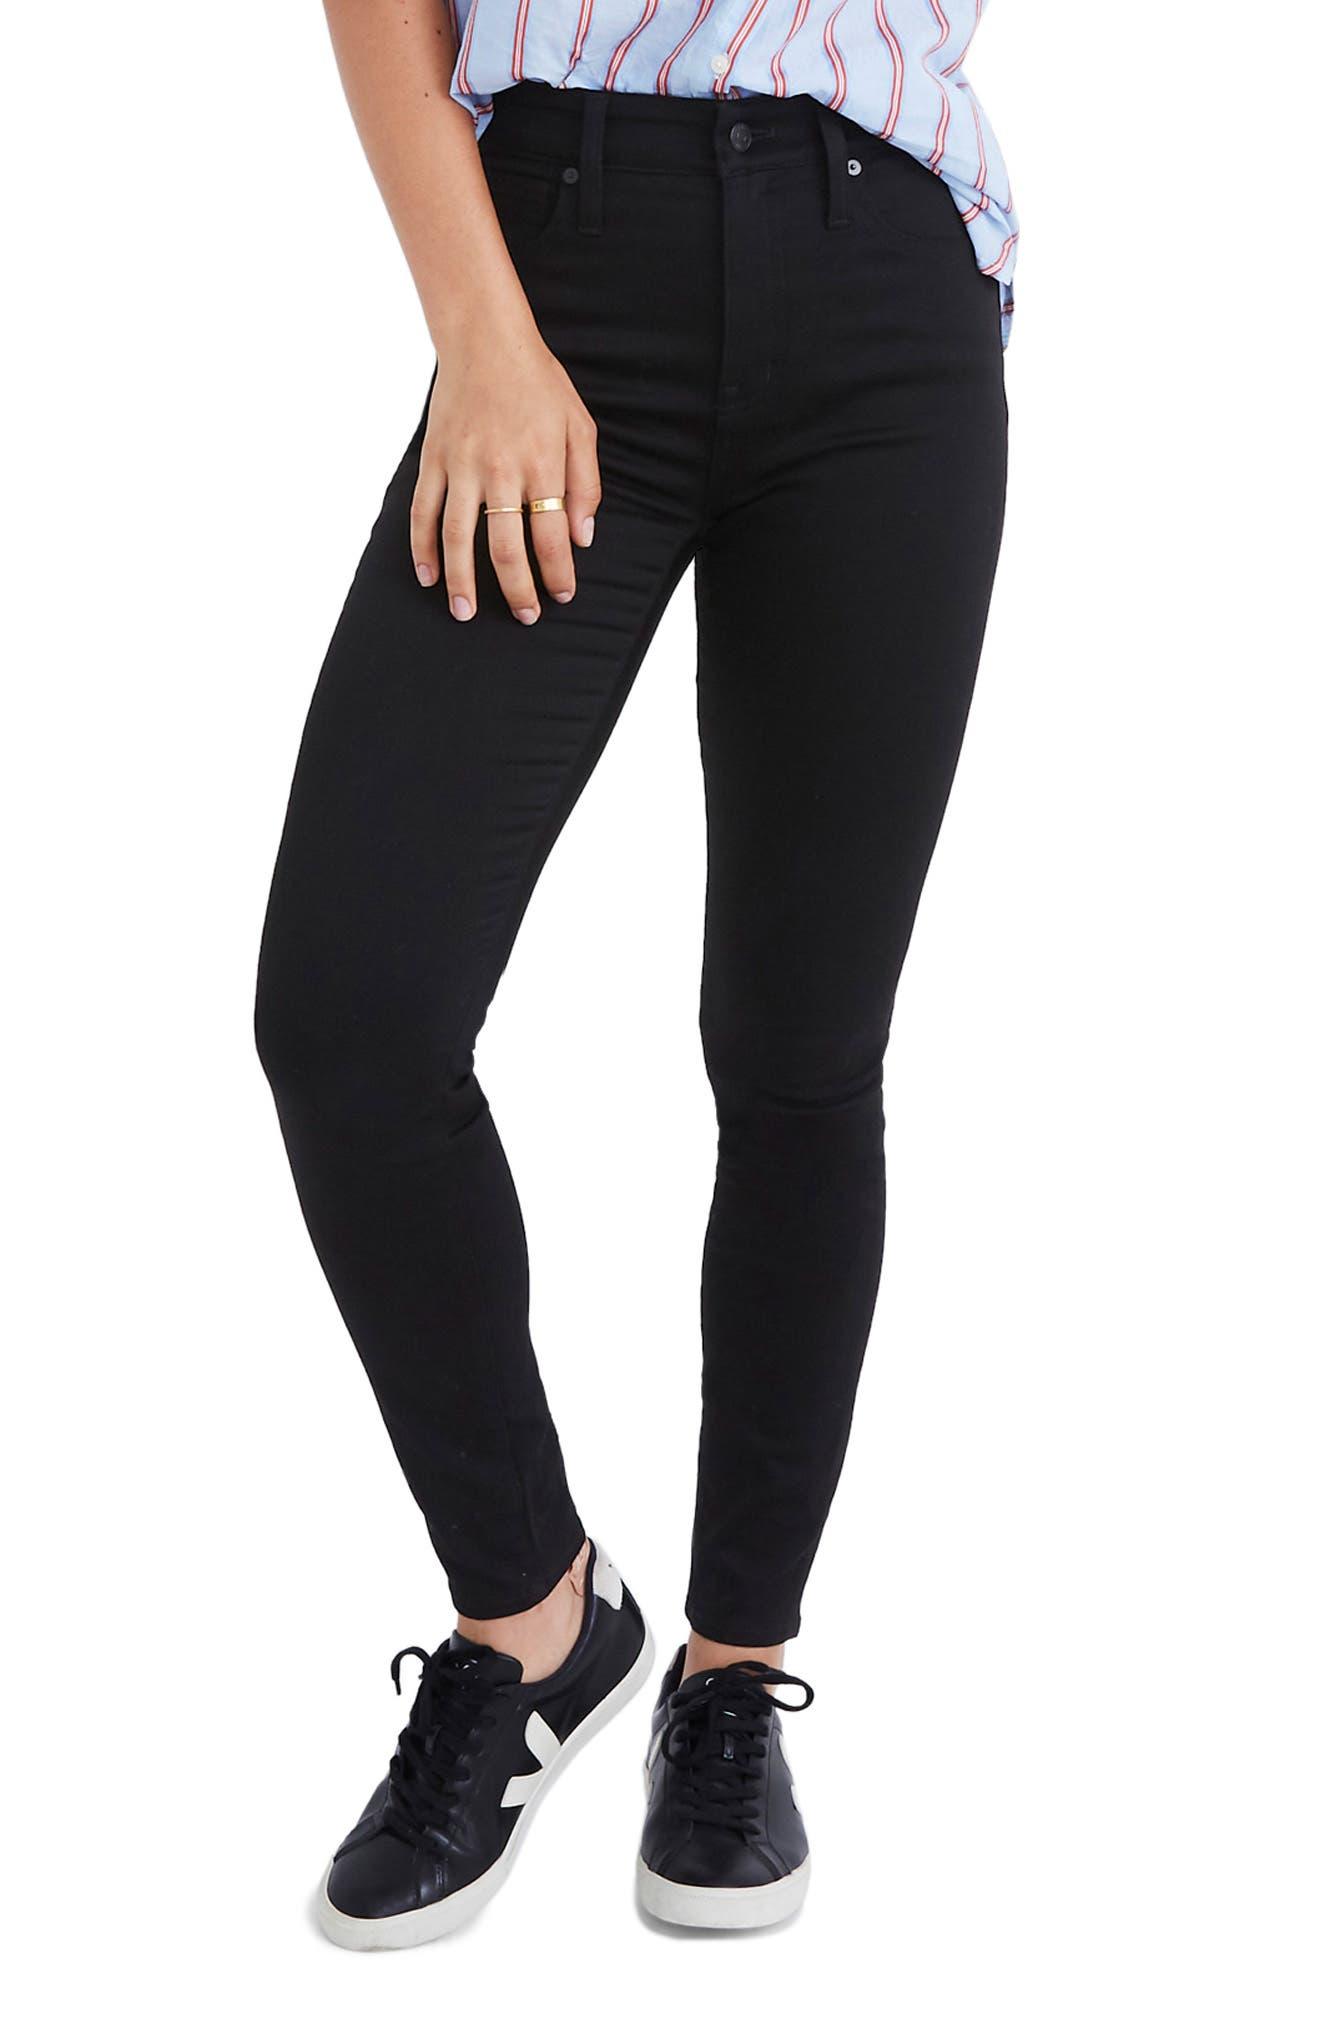 Curvy High Waist Skinny Jeans